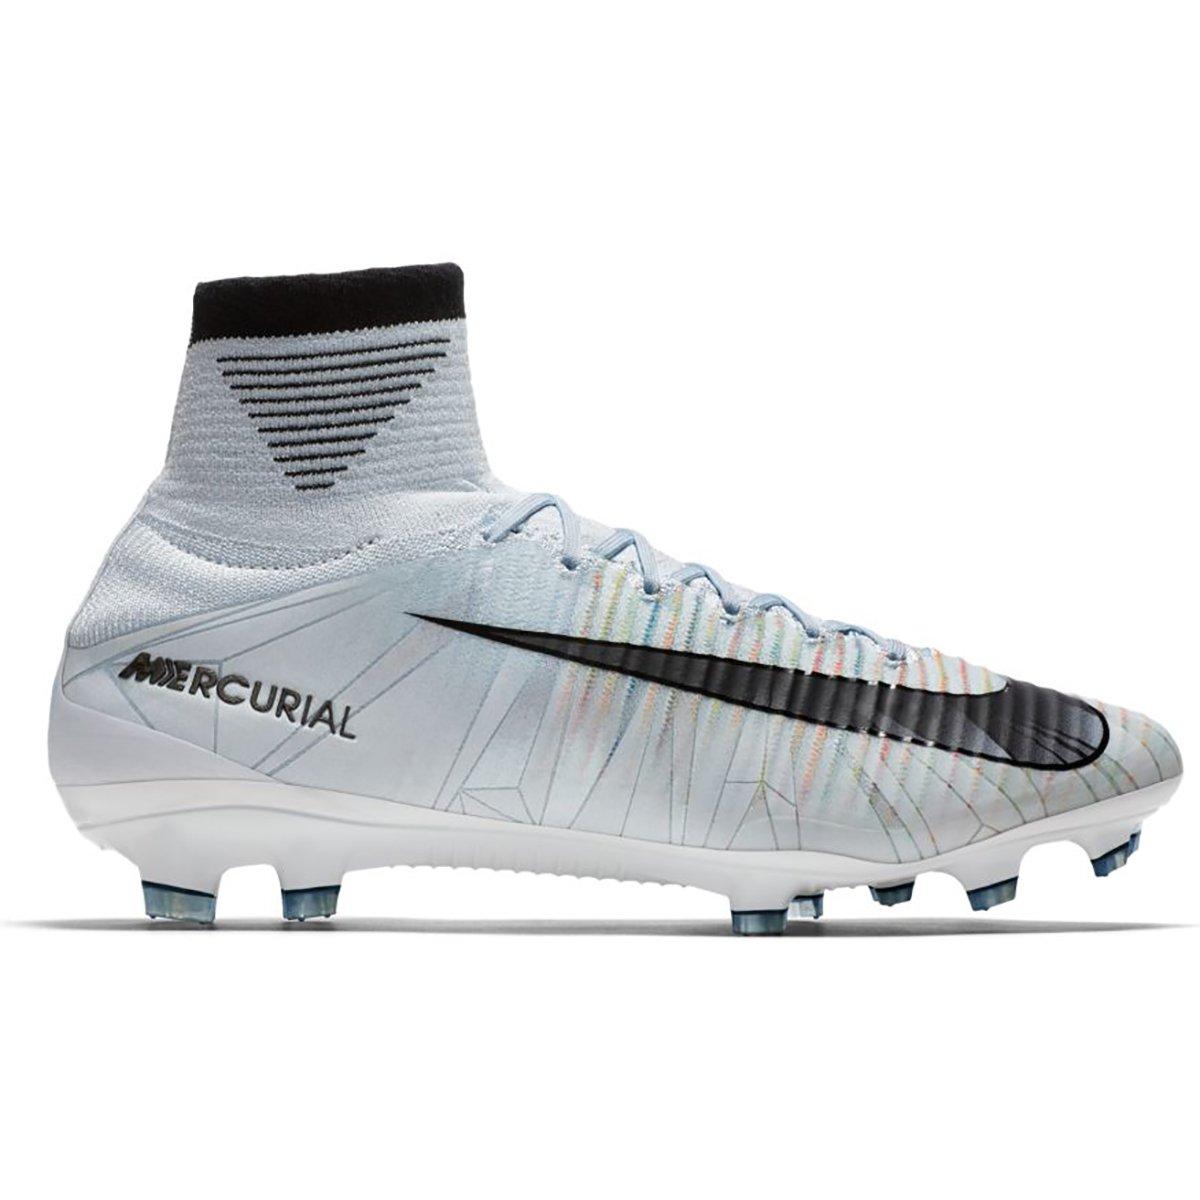 Nike Herren 852511-376 852511-376 852511-376 Fußballschuhe B07627Q58J  2b21f3